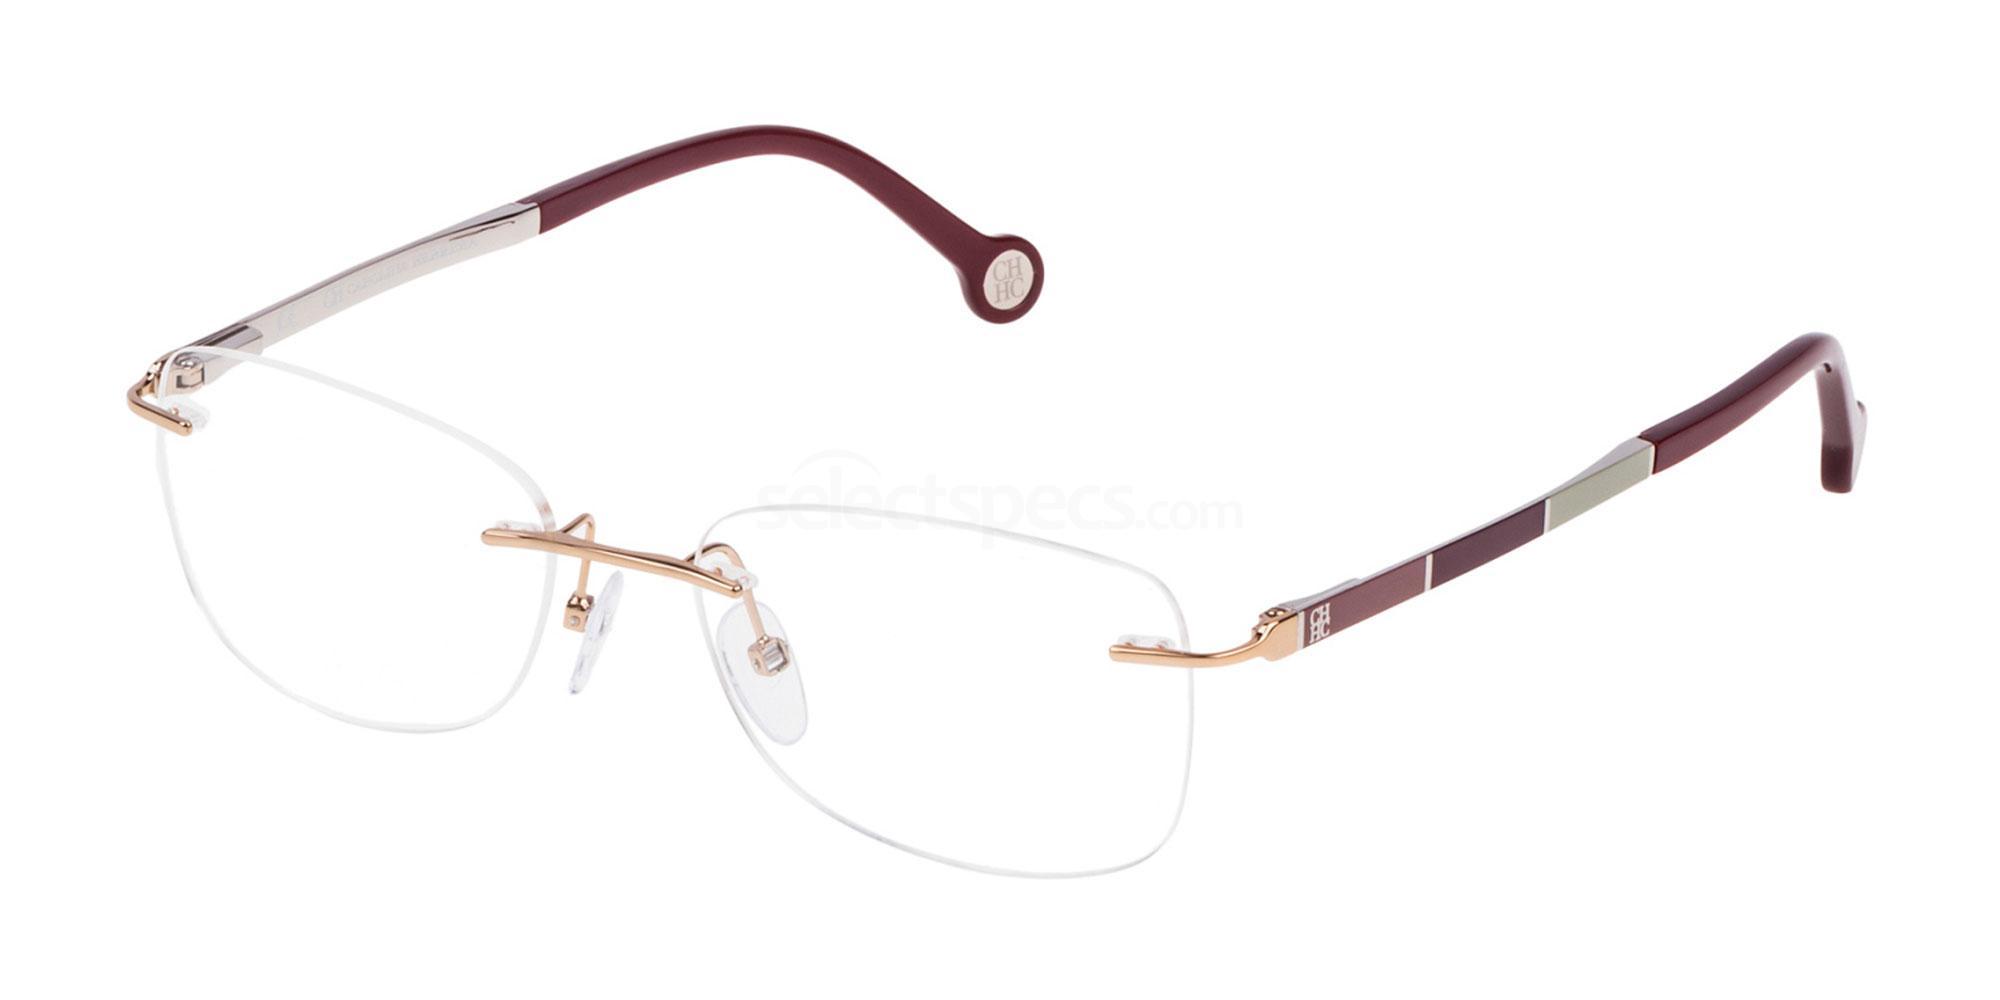 0300 VHE078 Glasses, CH Carolina Herrera